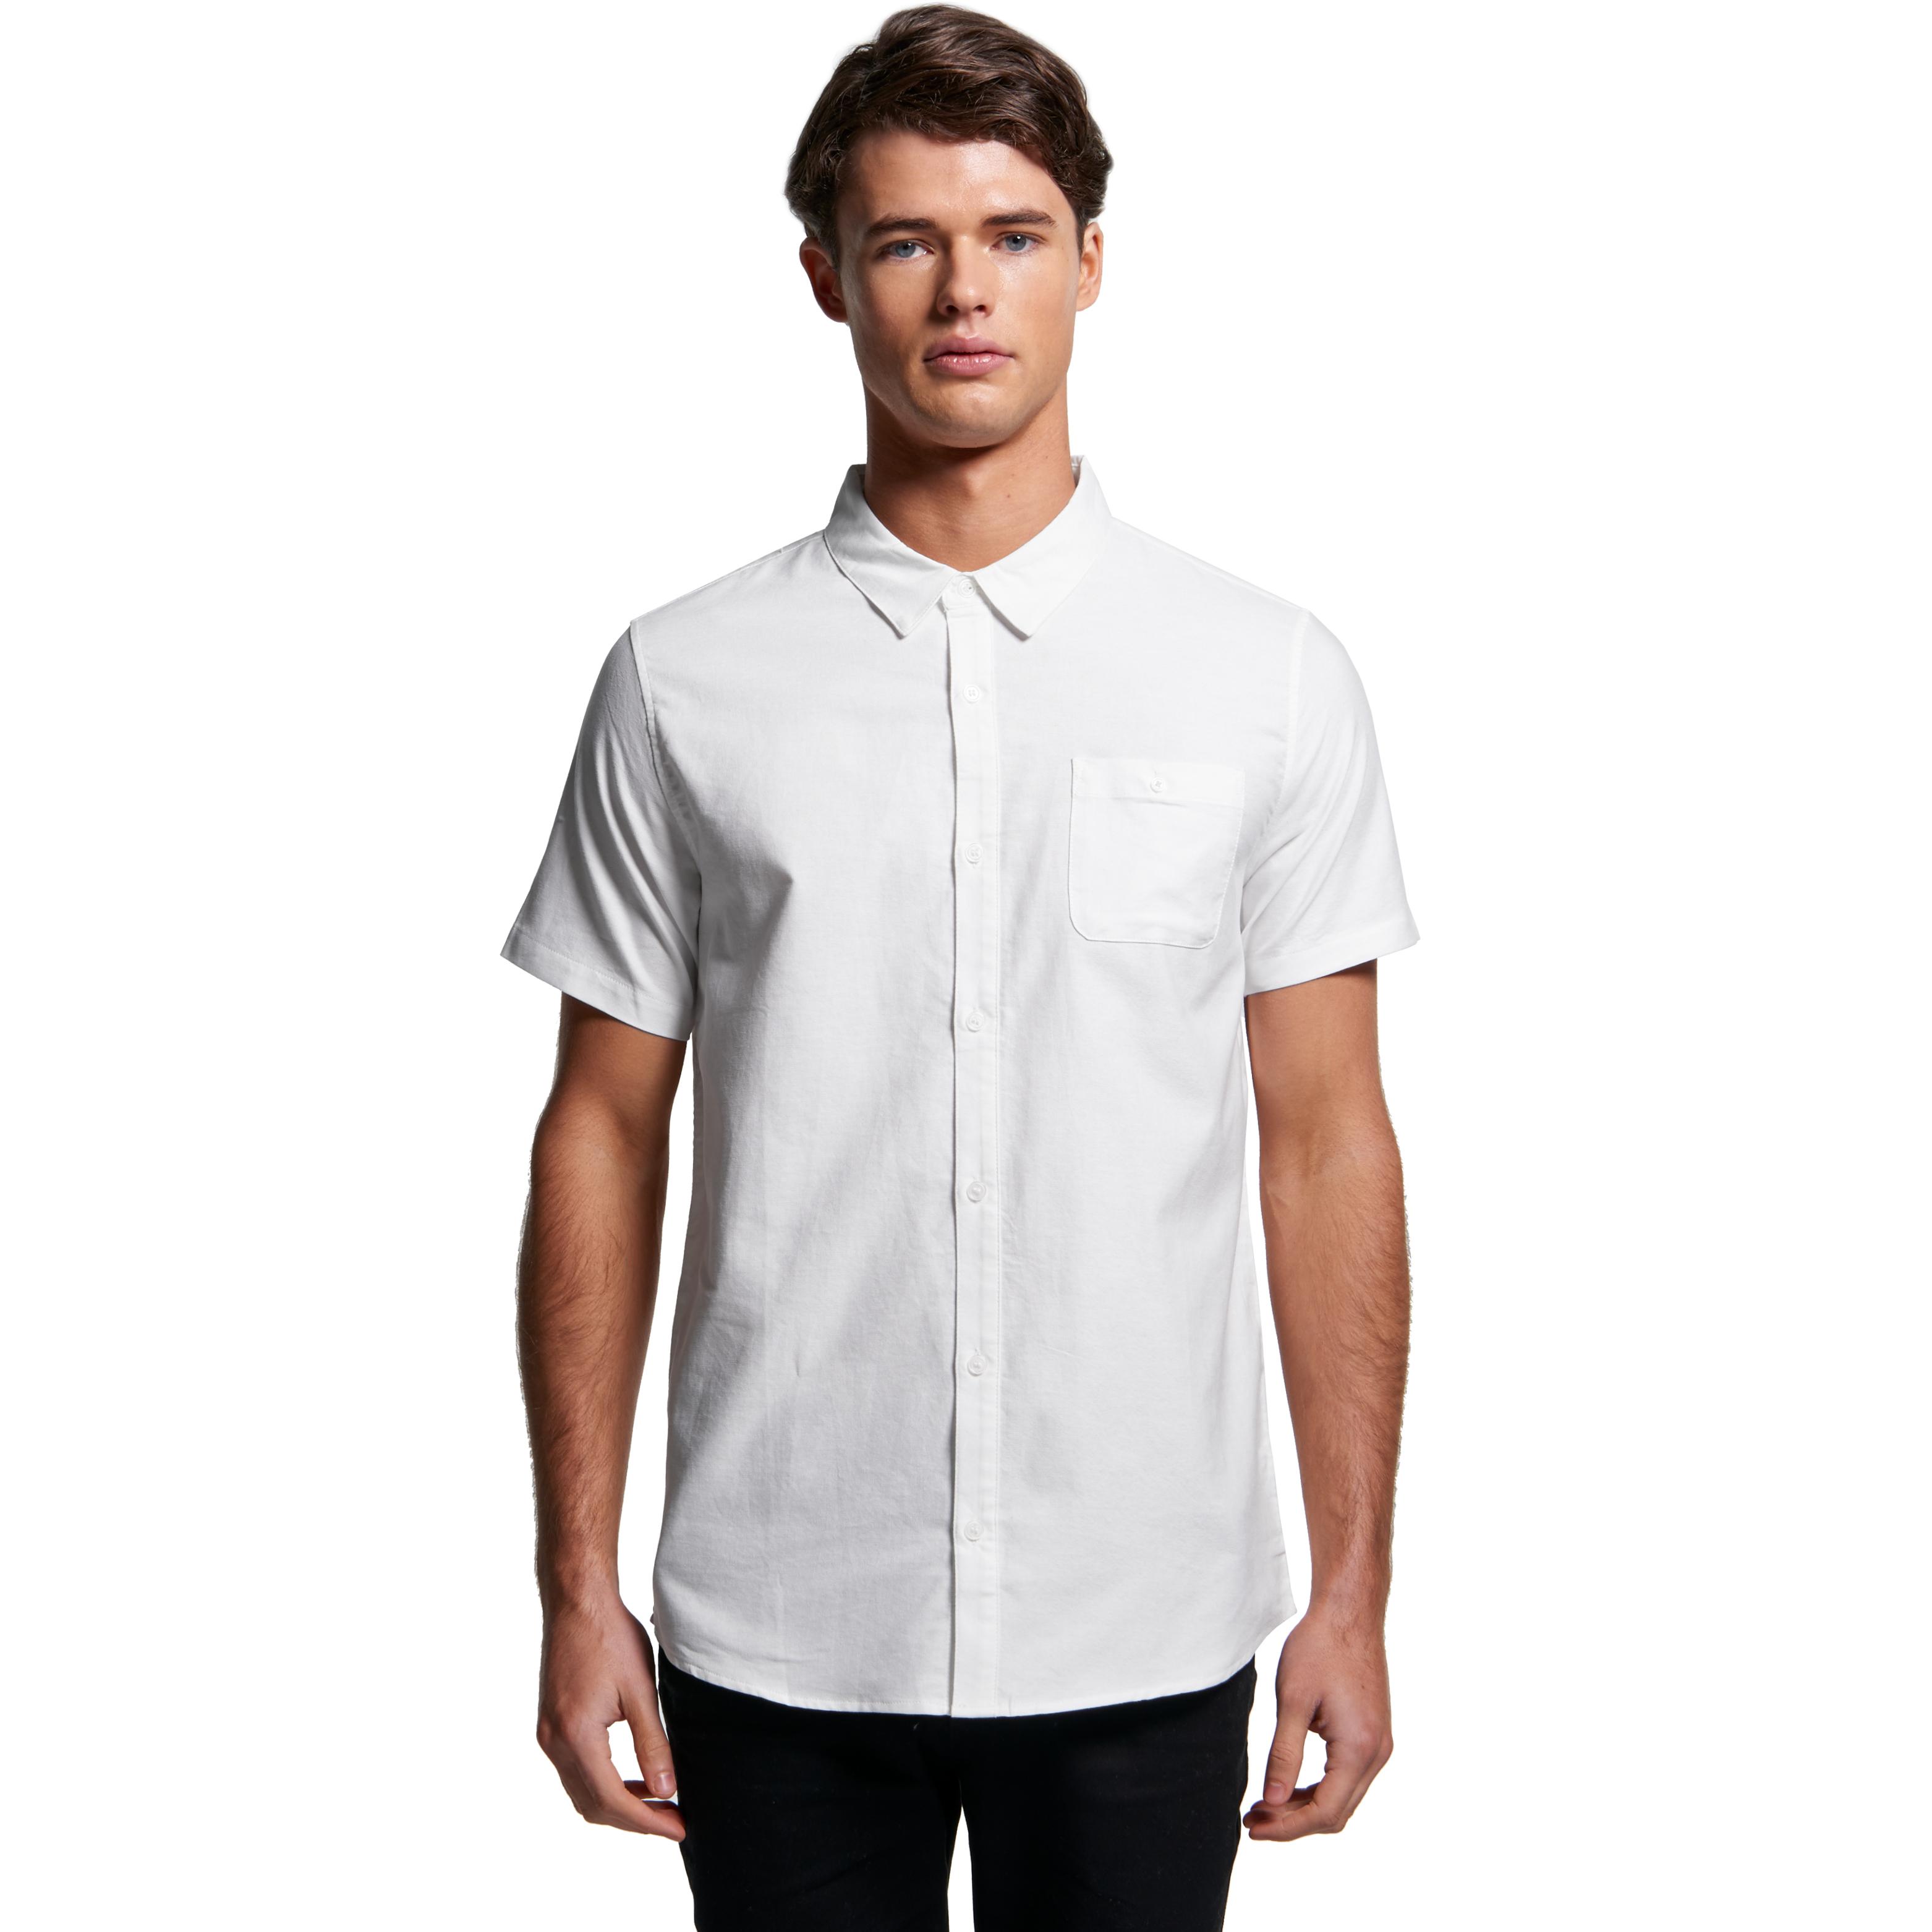 AS Colour Oxford Short Sleeve Shirt